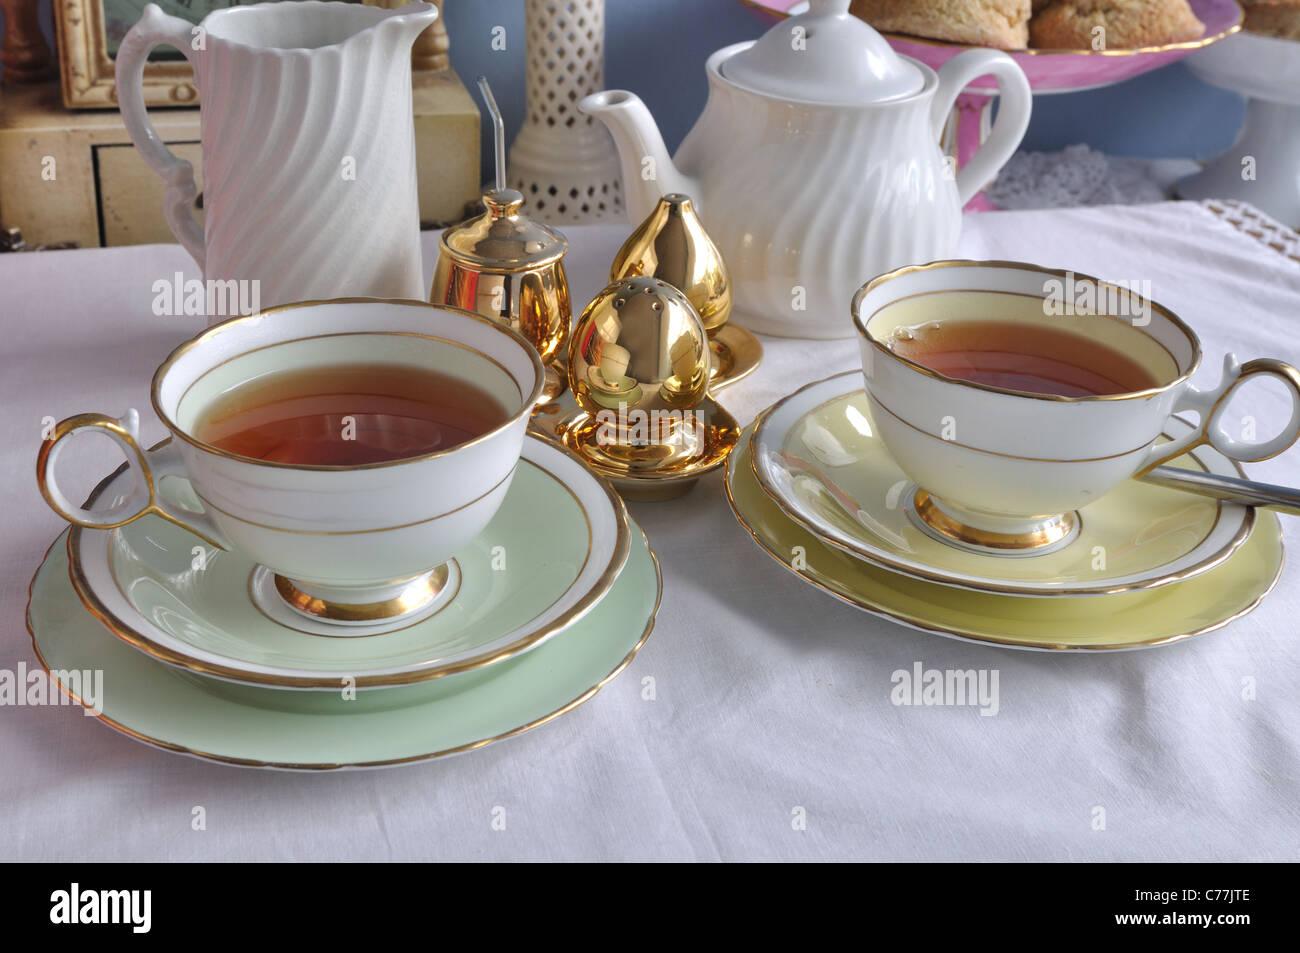 Afternoon tea setting - Stock Image